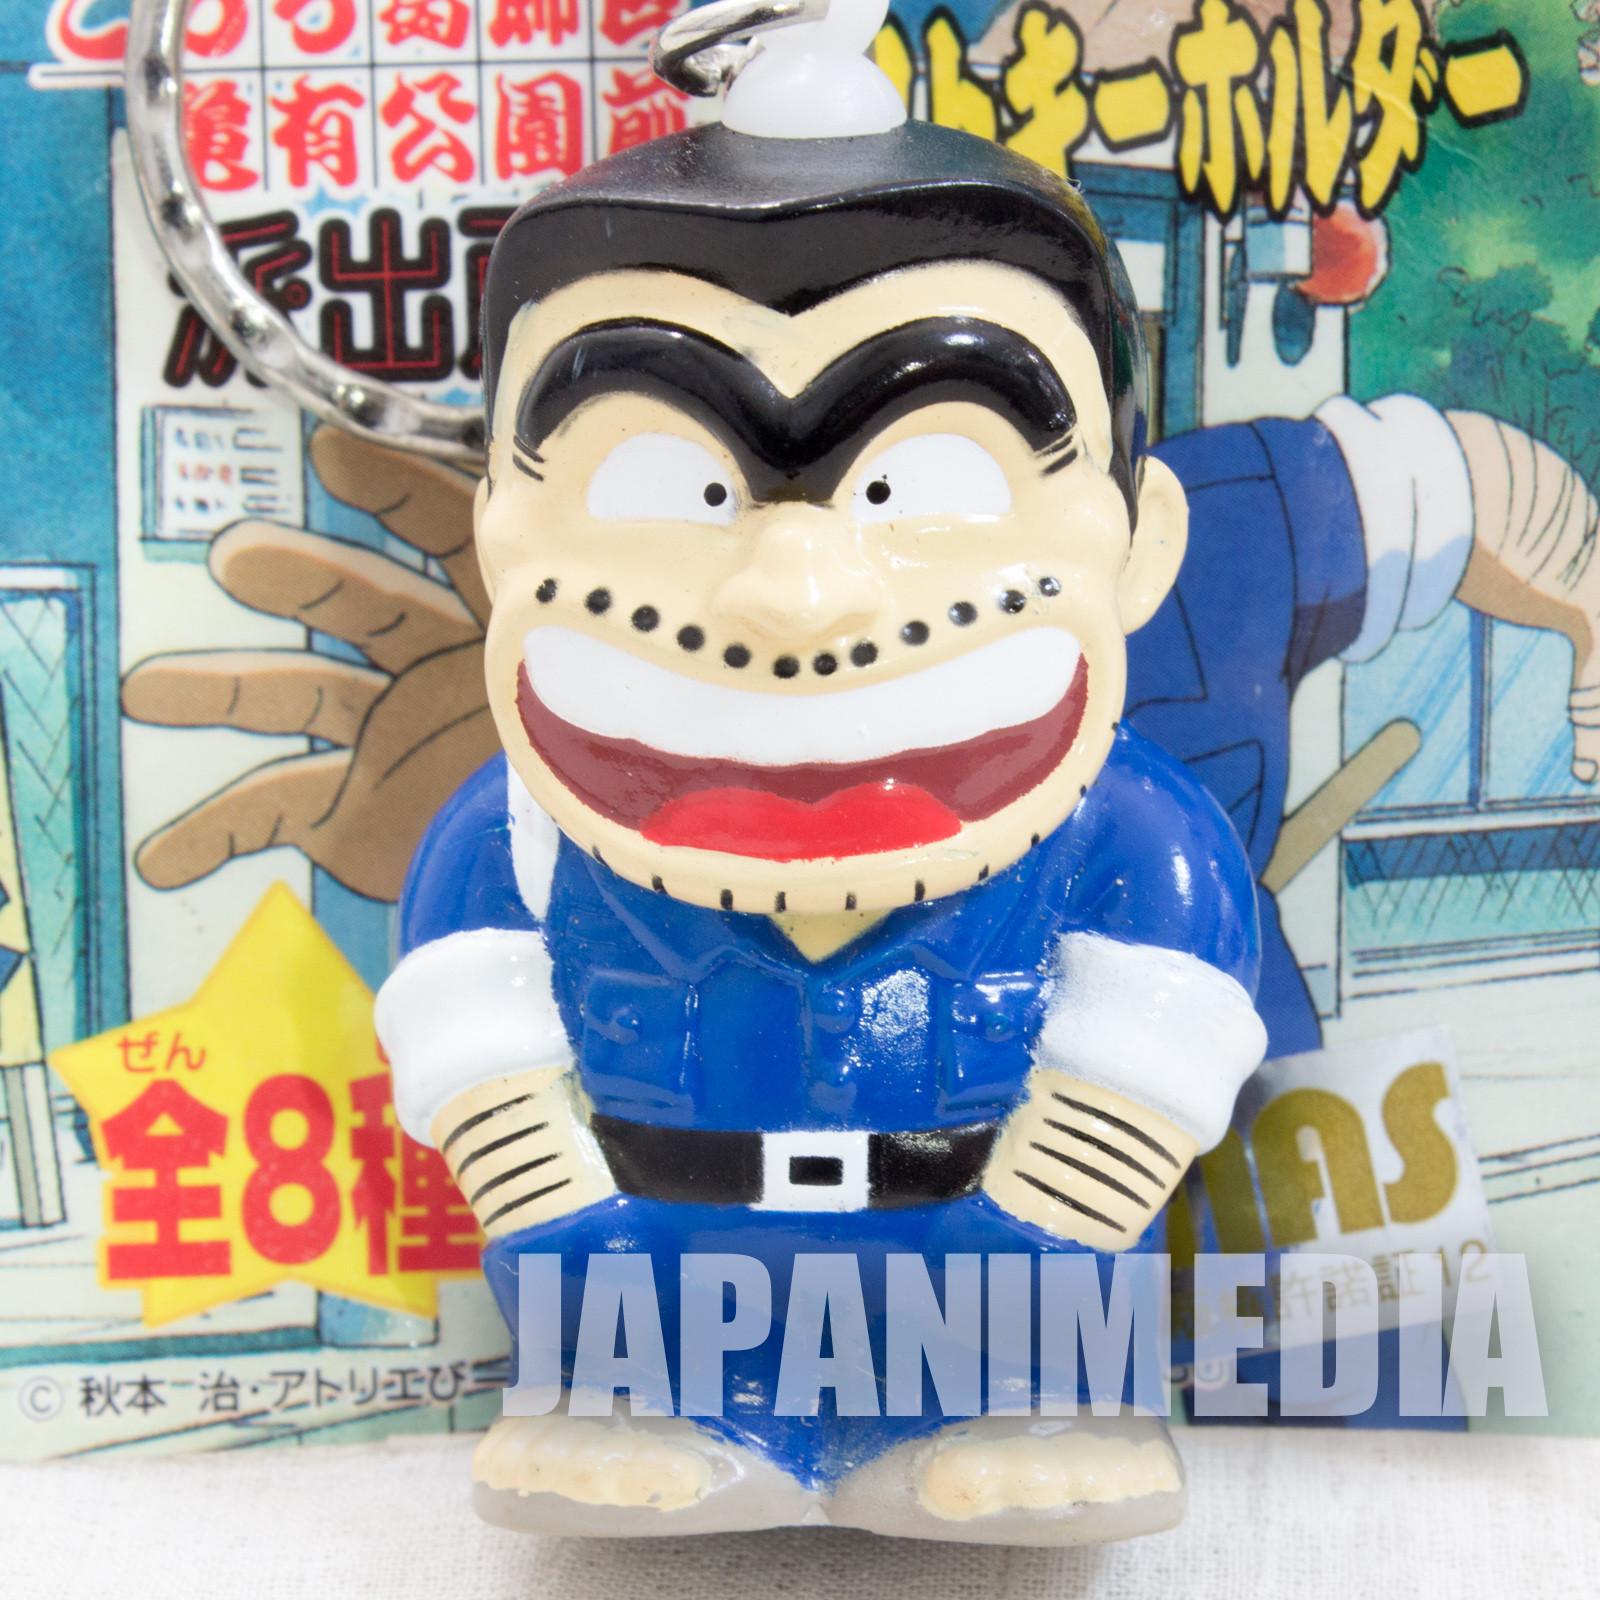 KochiKame Kankichi Ryotsu #1 Soft Vinyl Figure Keychain JAPAN ANIME